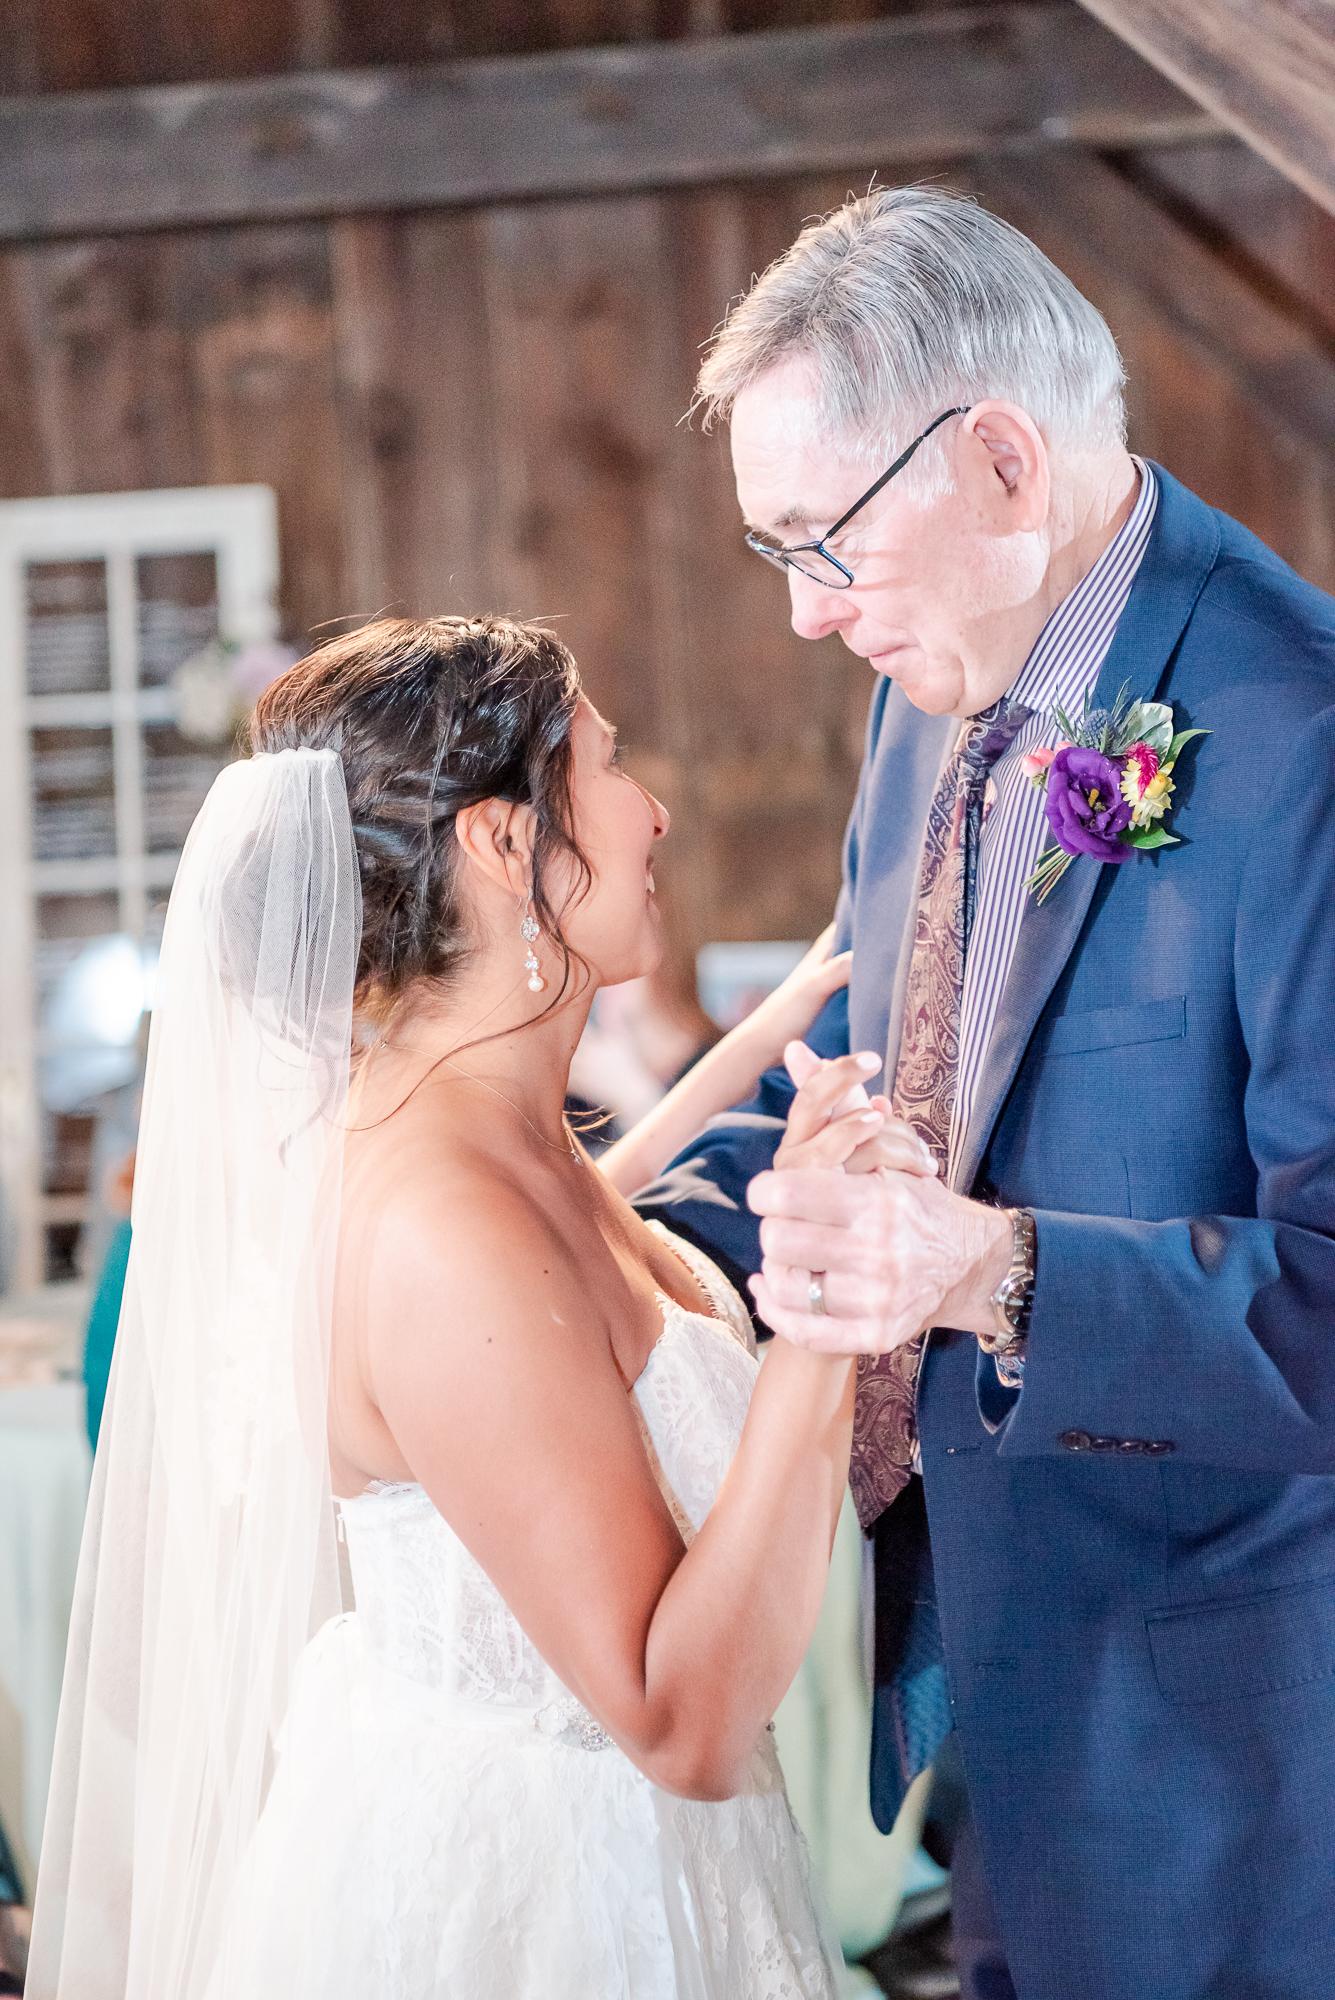 Maria+Adam_Summer Barn Wedding_The Barn at The North Star Preserve_Oberlin_Ohio-195.jpg